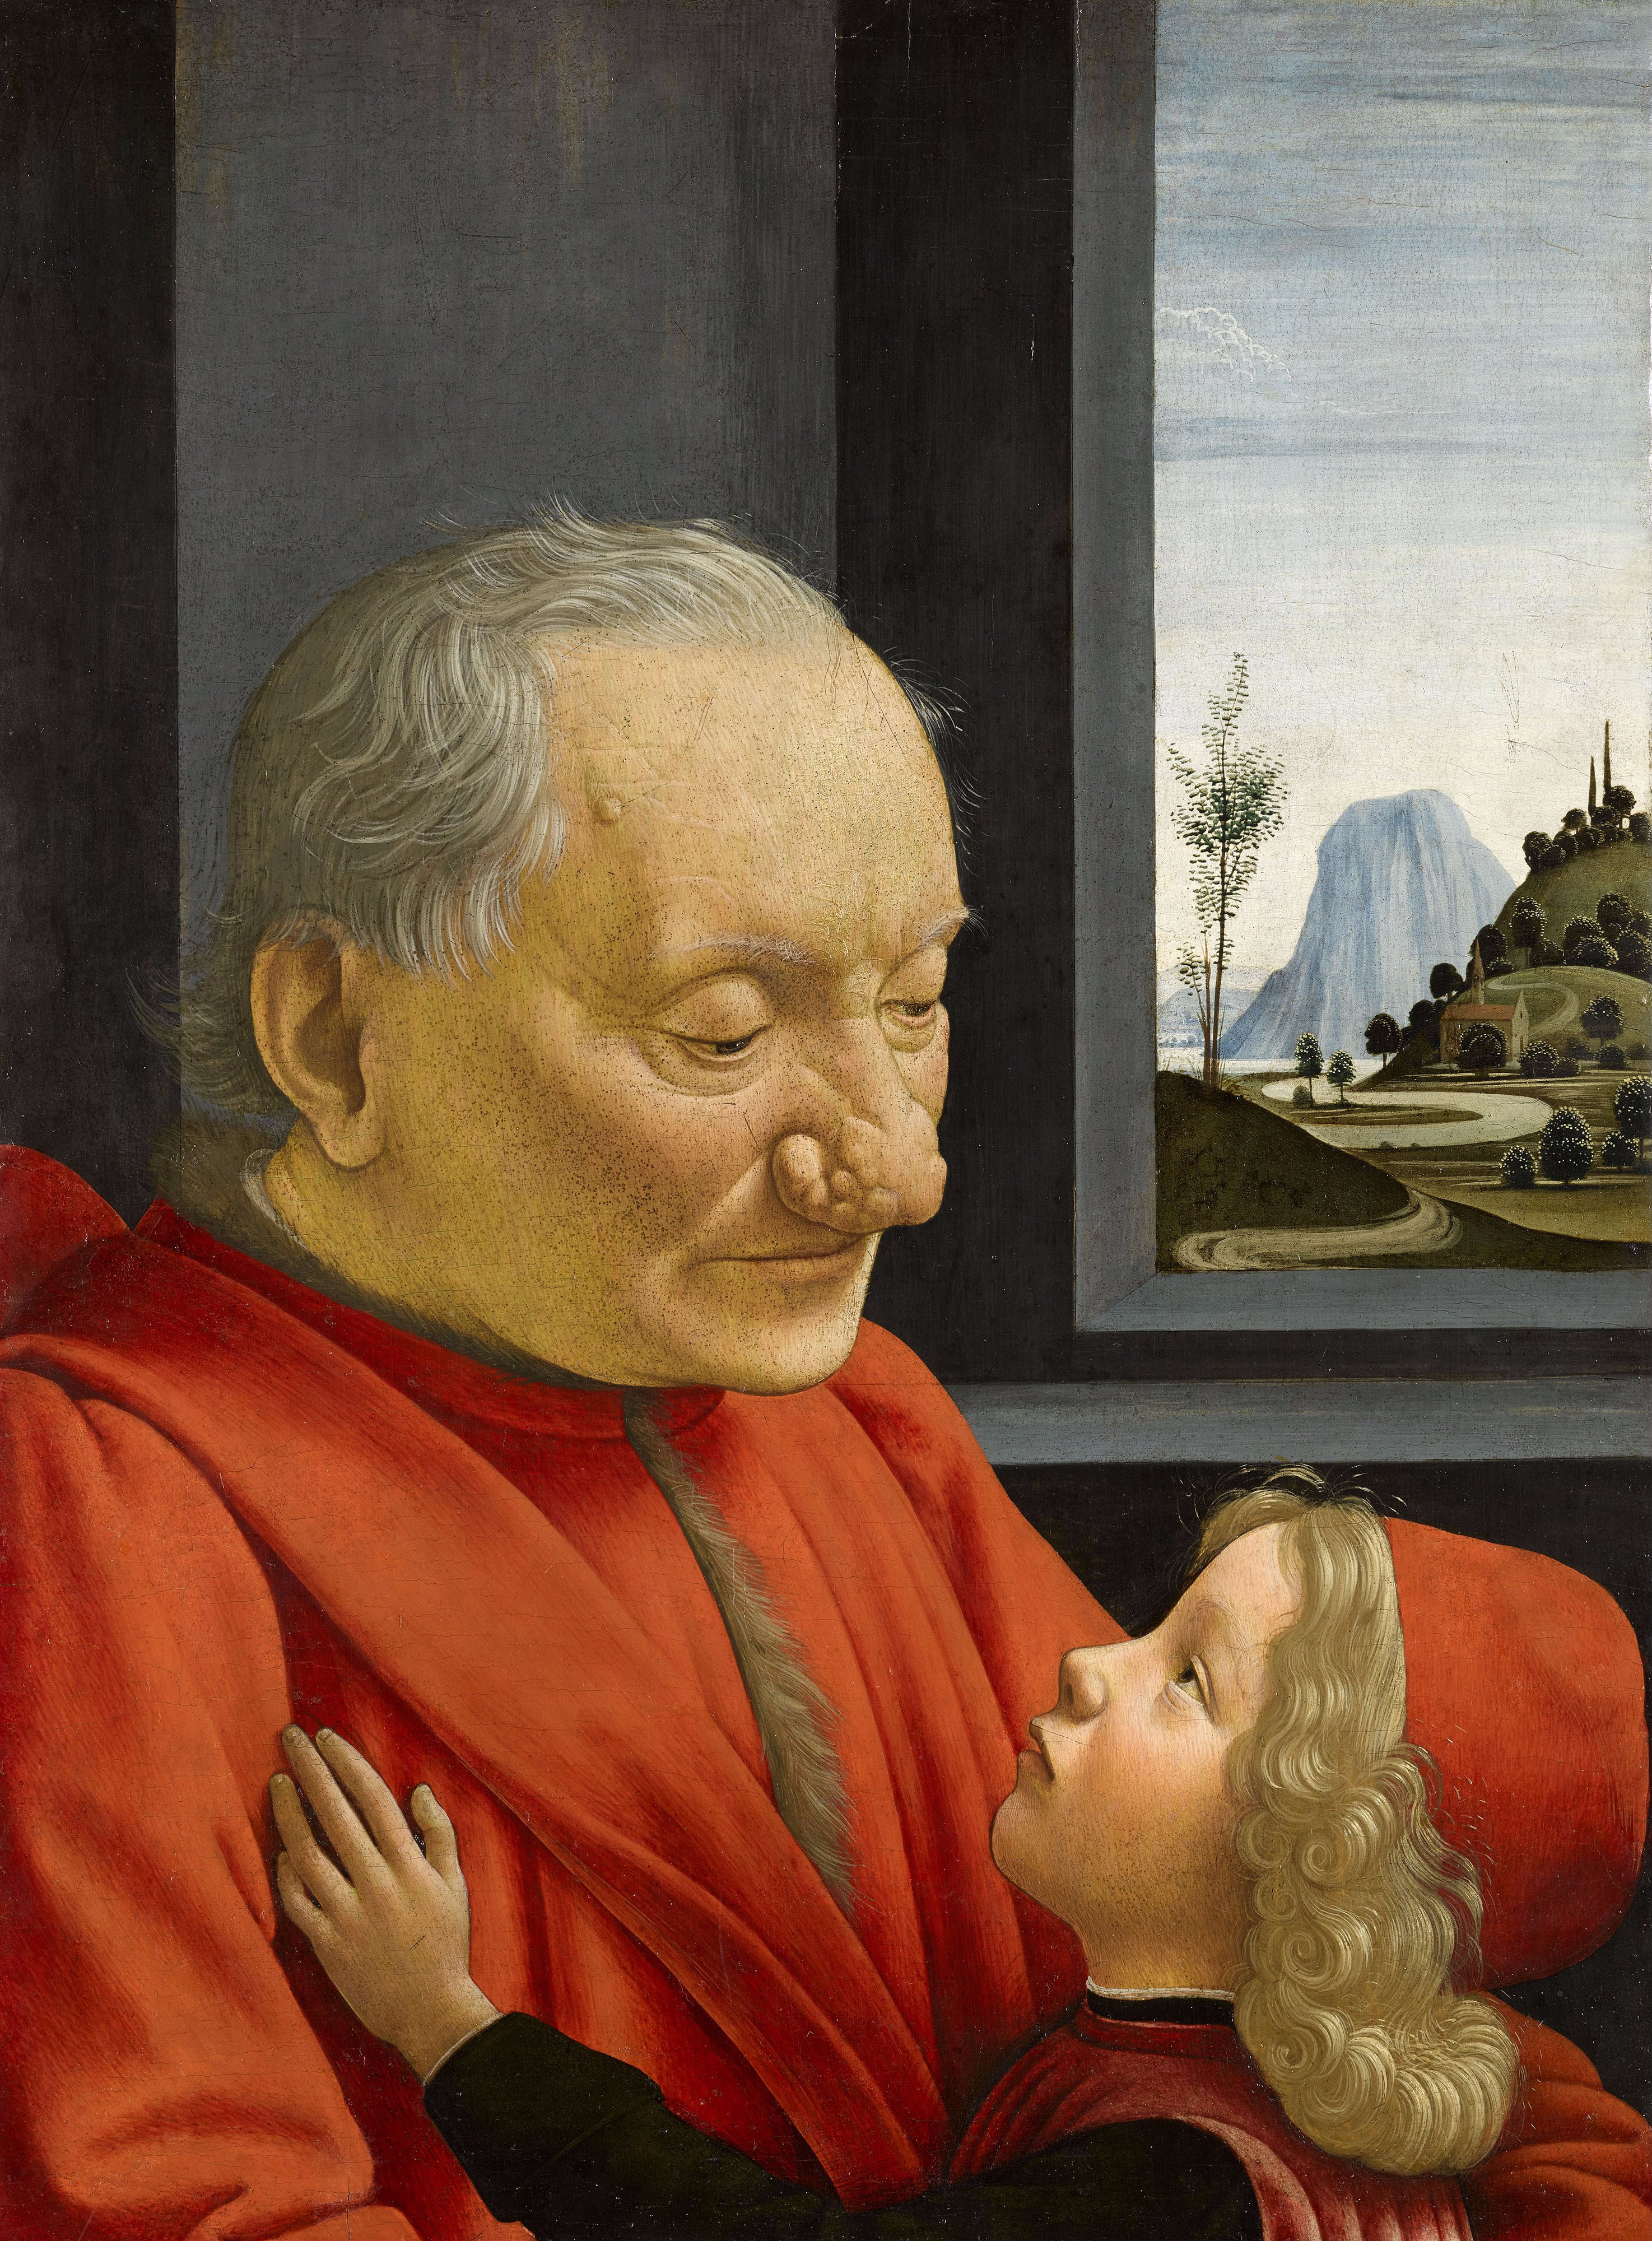 Portrait d'un vieillard et d'un jeune garçon — Wikipédia